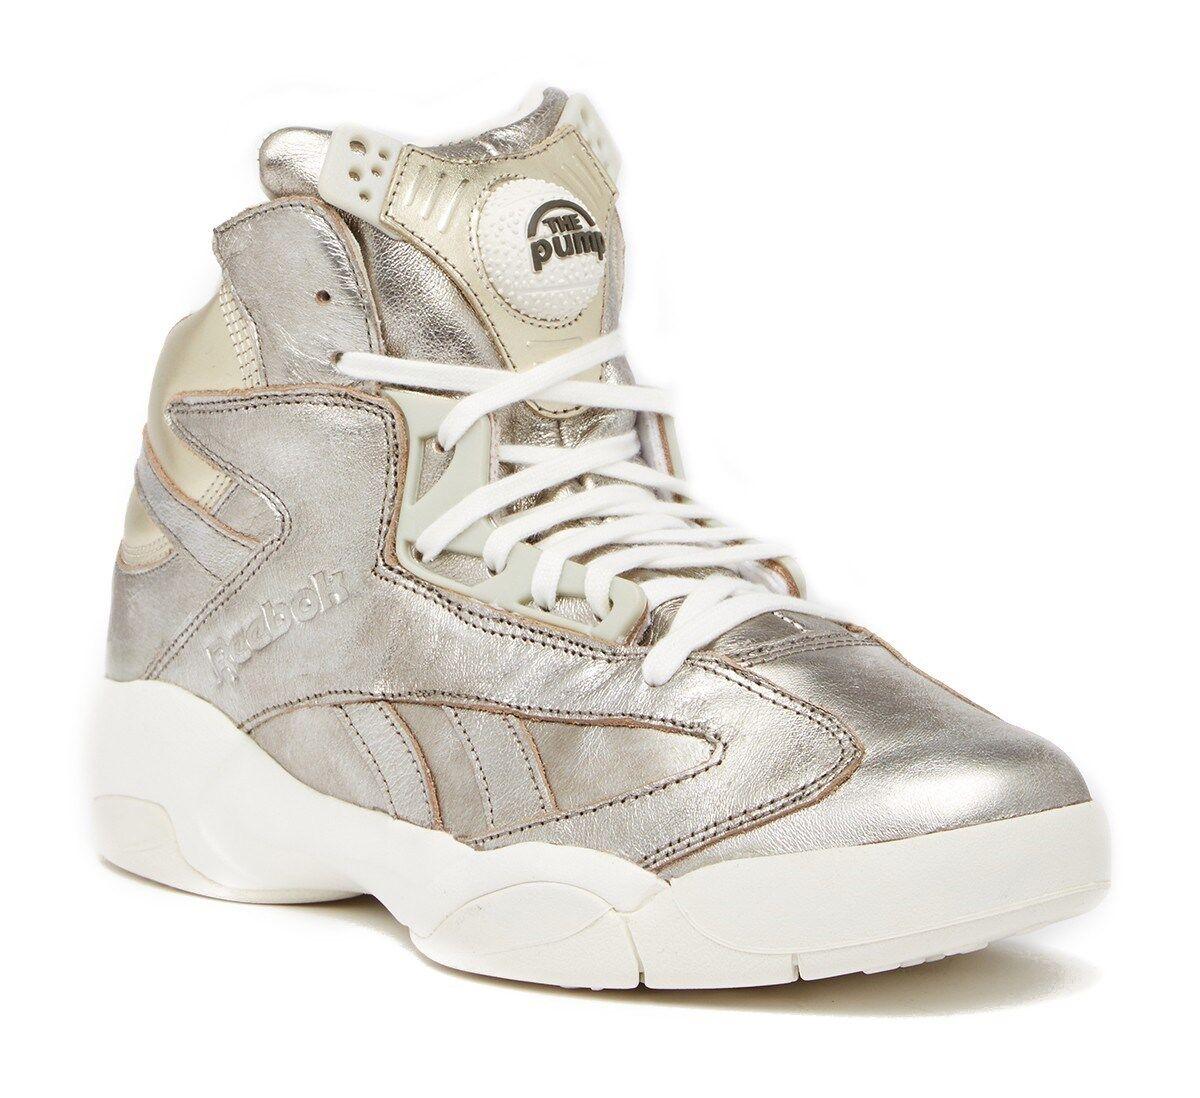 250 NWOB Reebok Shaq Attaq Leather Mid scarpe da ginnastica, Dimensione 7.5US, Coloreeeee Space Fume